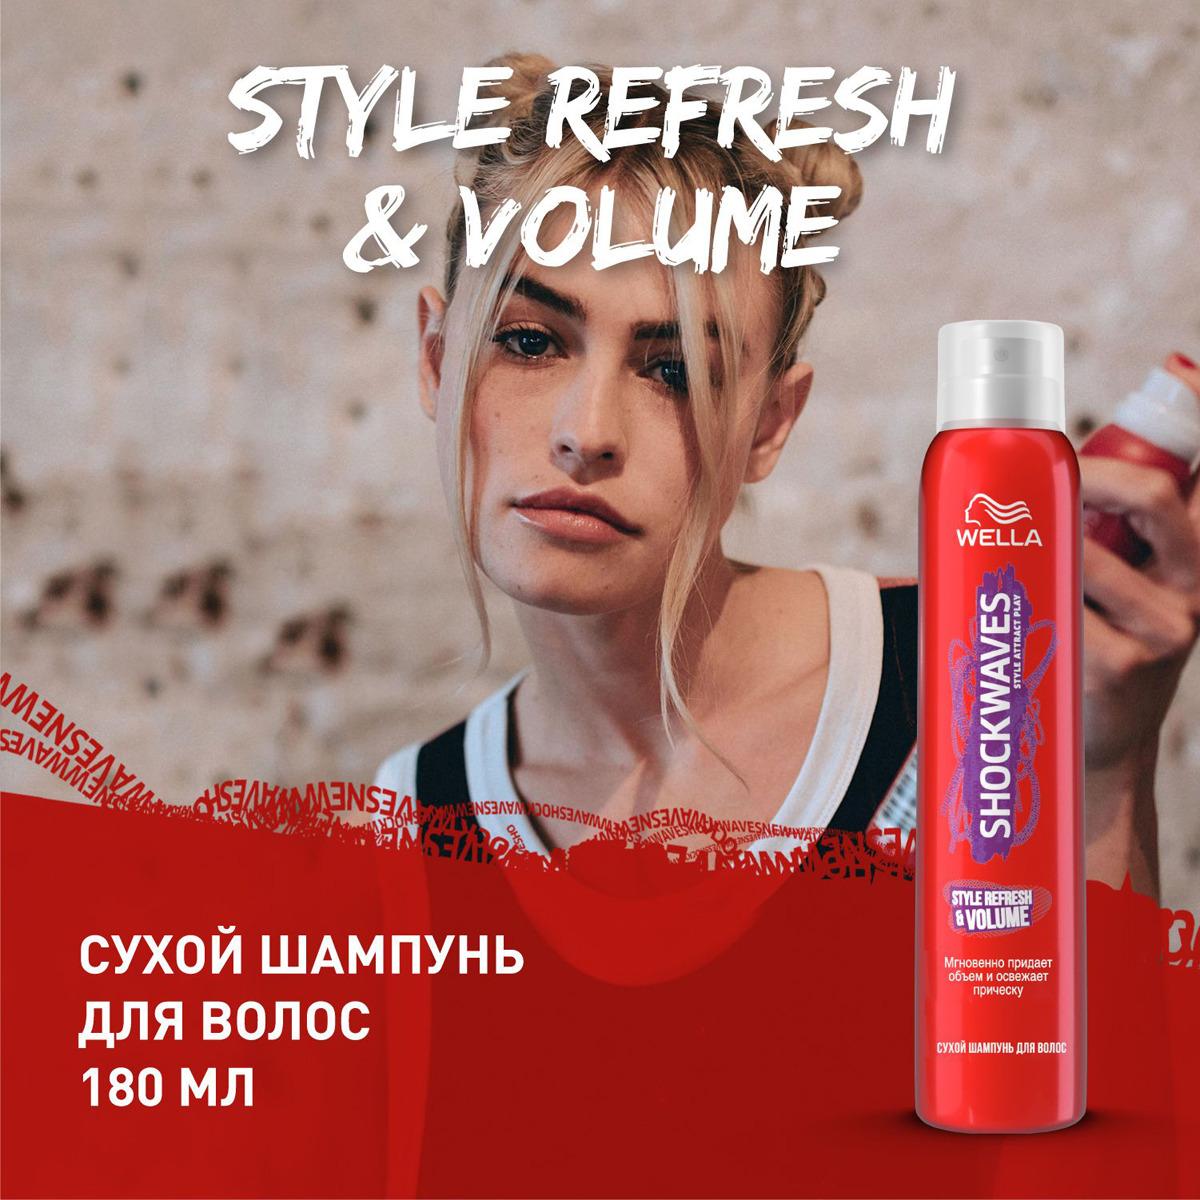 Сухой шампунь для волос Wella Shockwaves Style Refresh& Volume, 180мл Wella